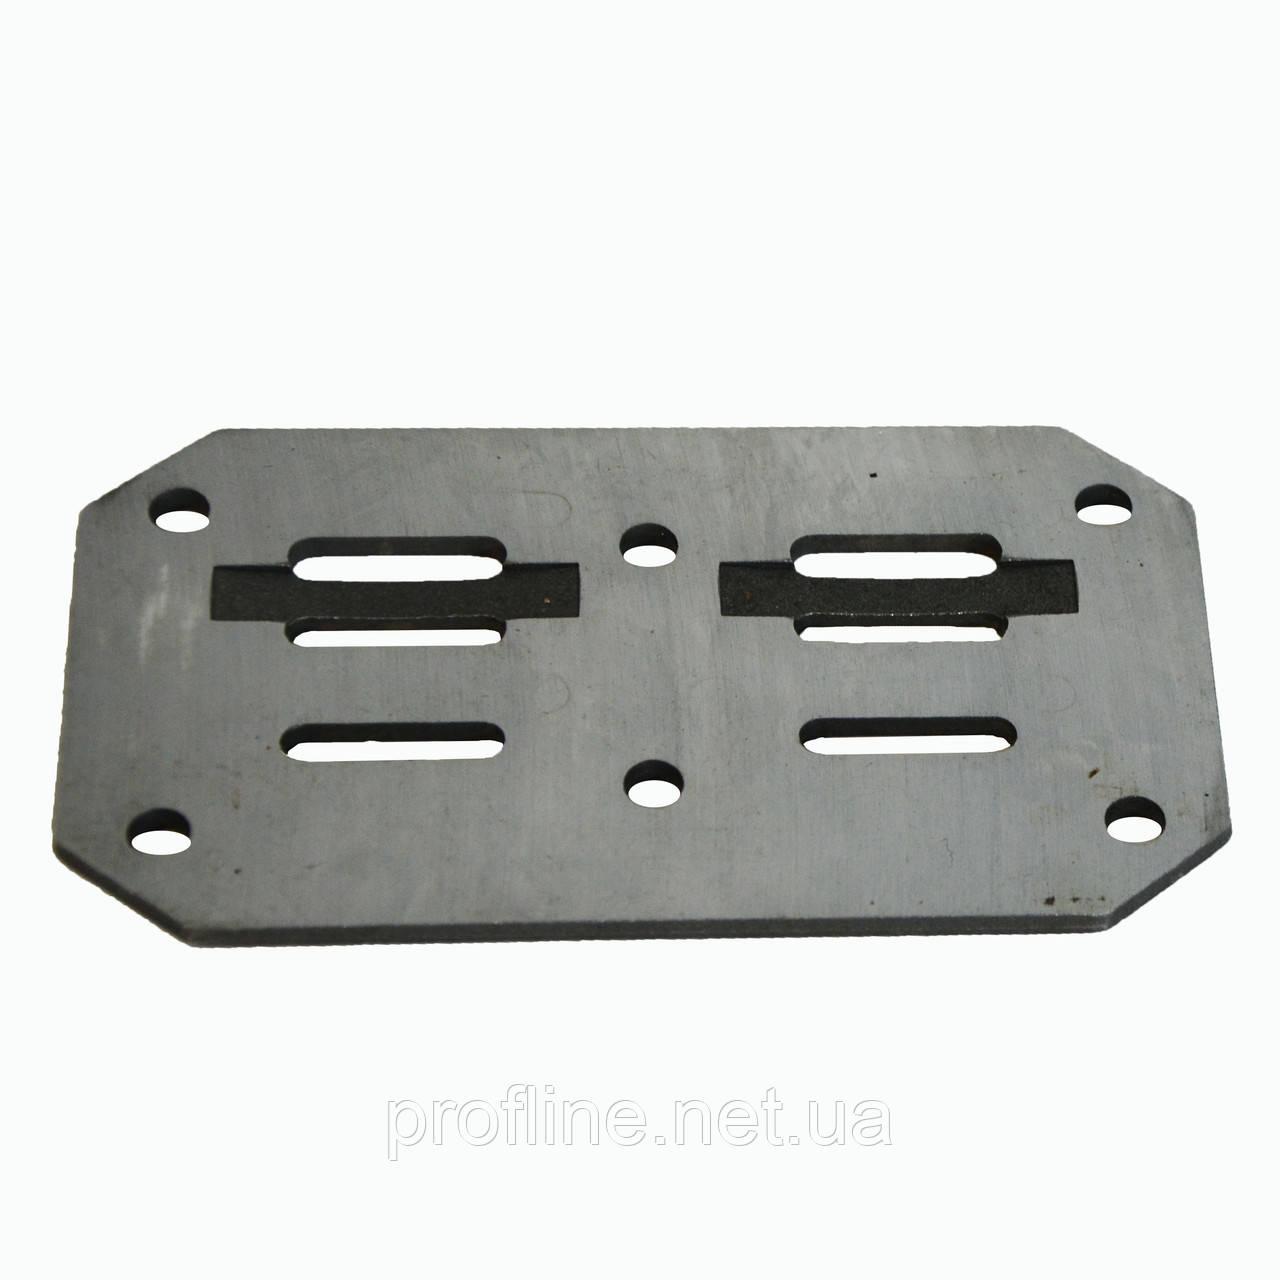 Клапанна пластина компресора 55 мм (2 шт) Profline 15B1